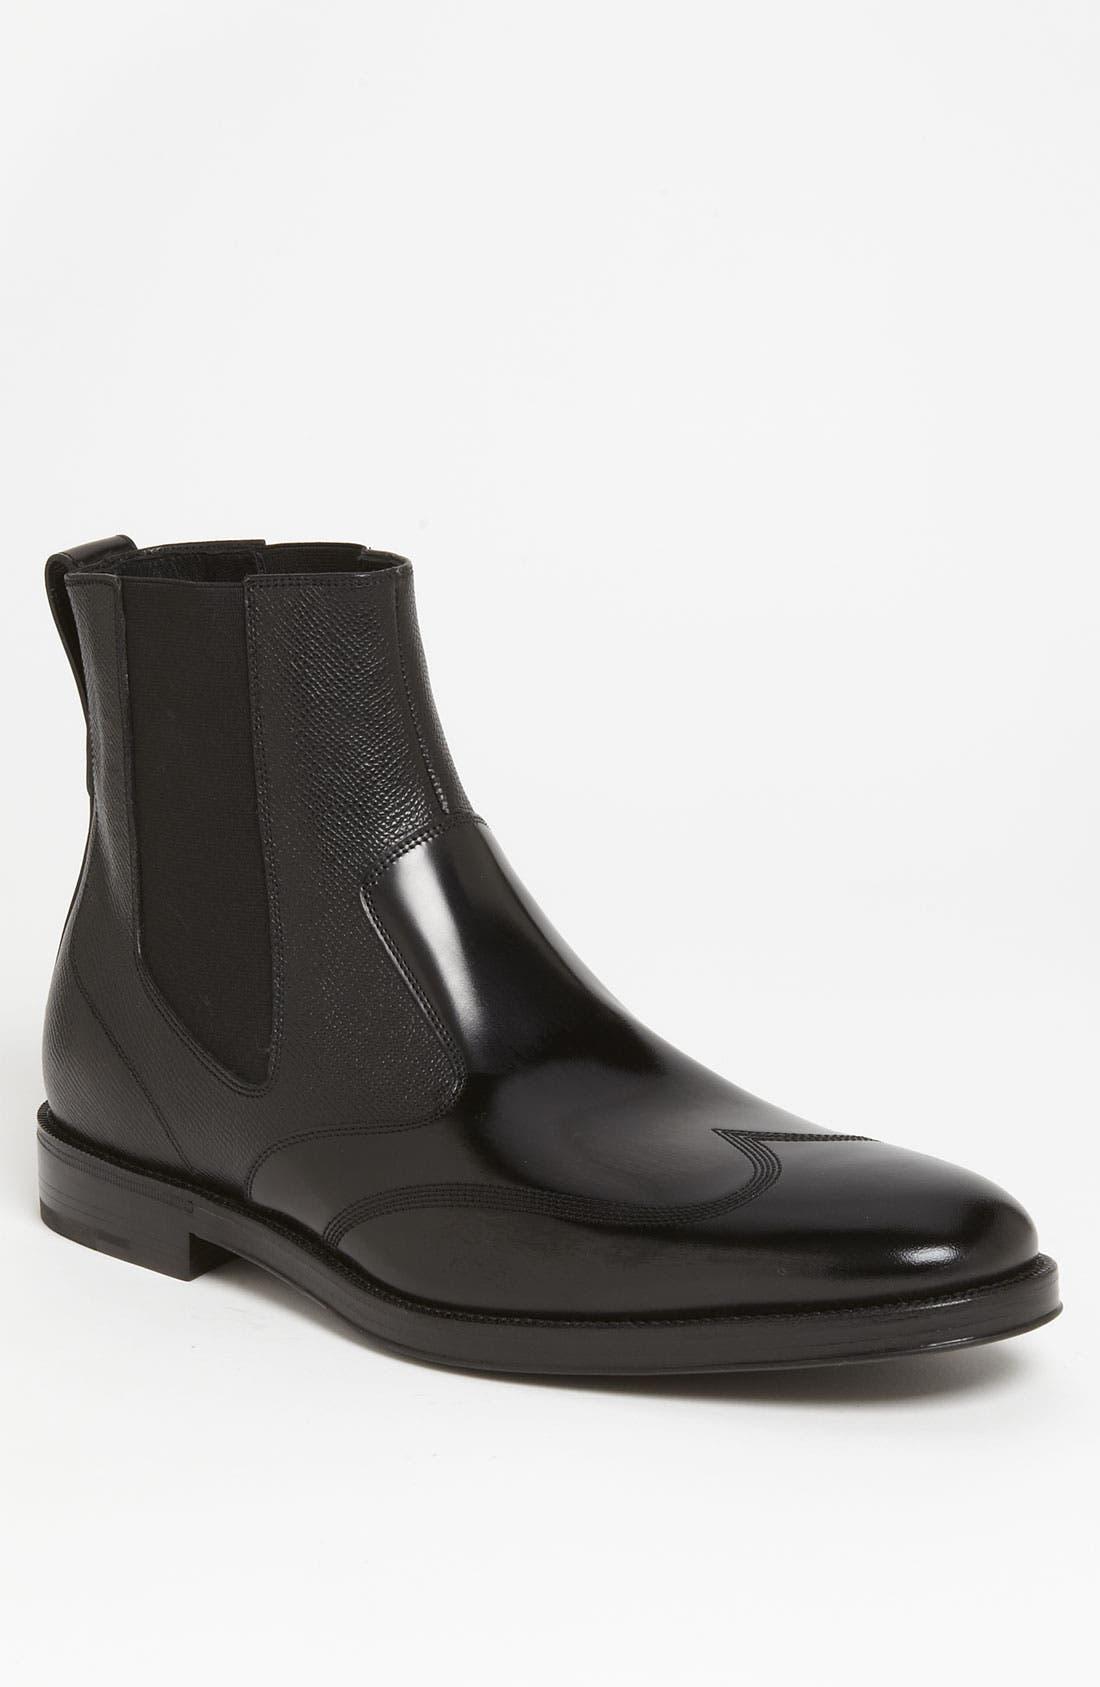 Main Image - Salvatore Ferragamo 'Aritz' Wingtip Chelsea Boot